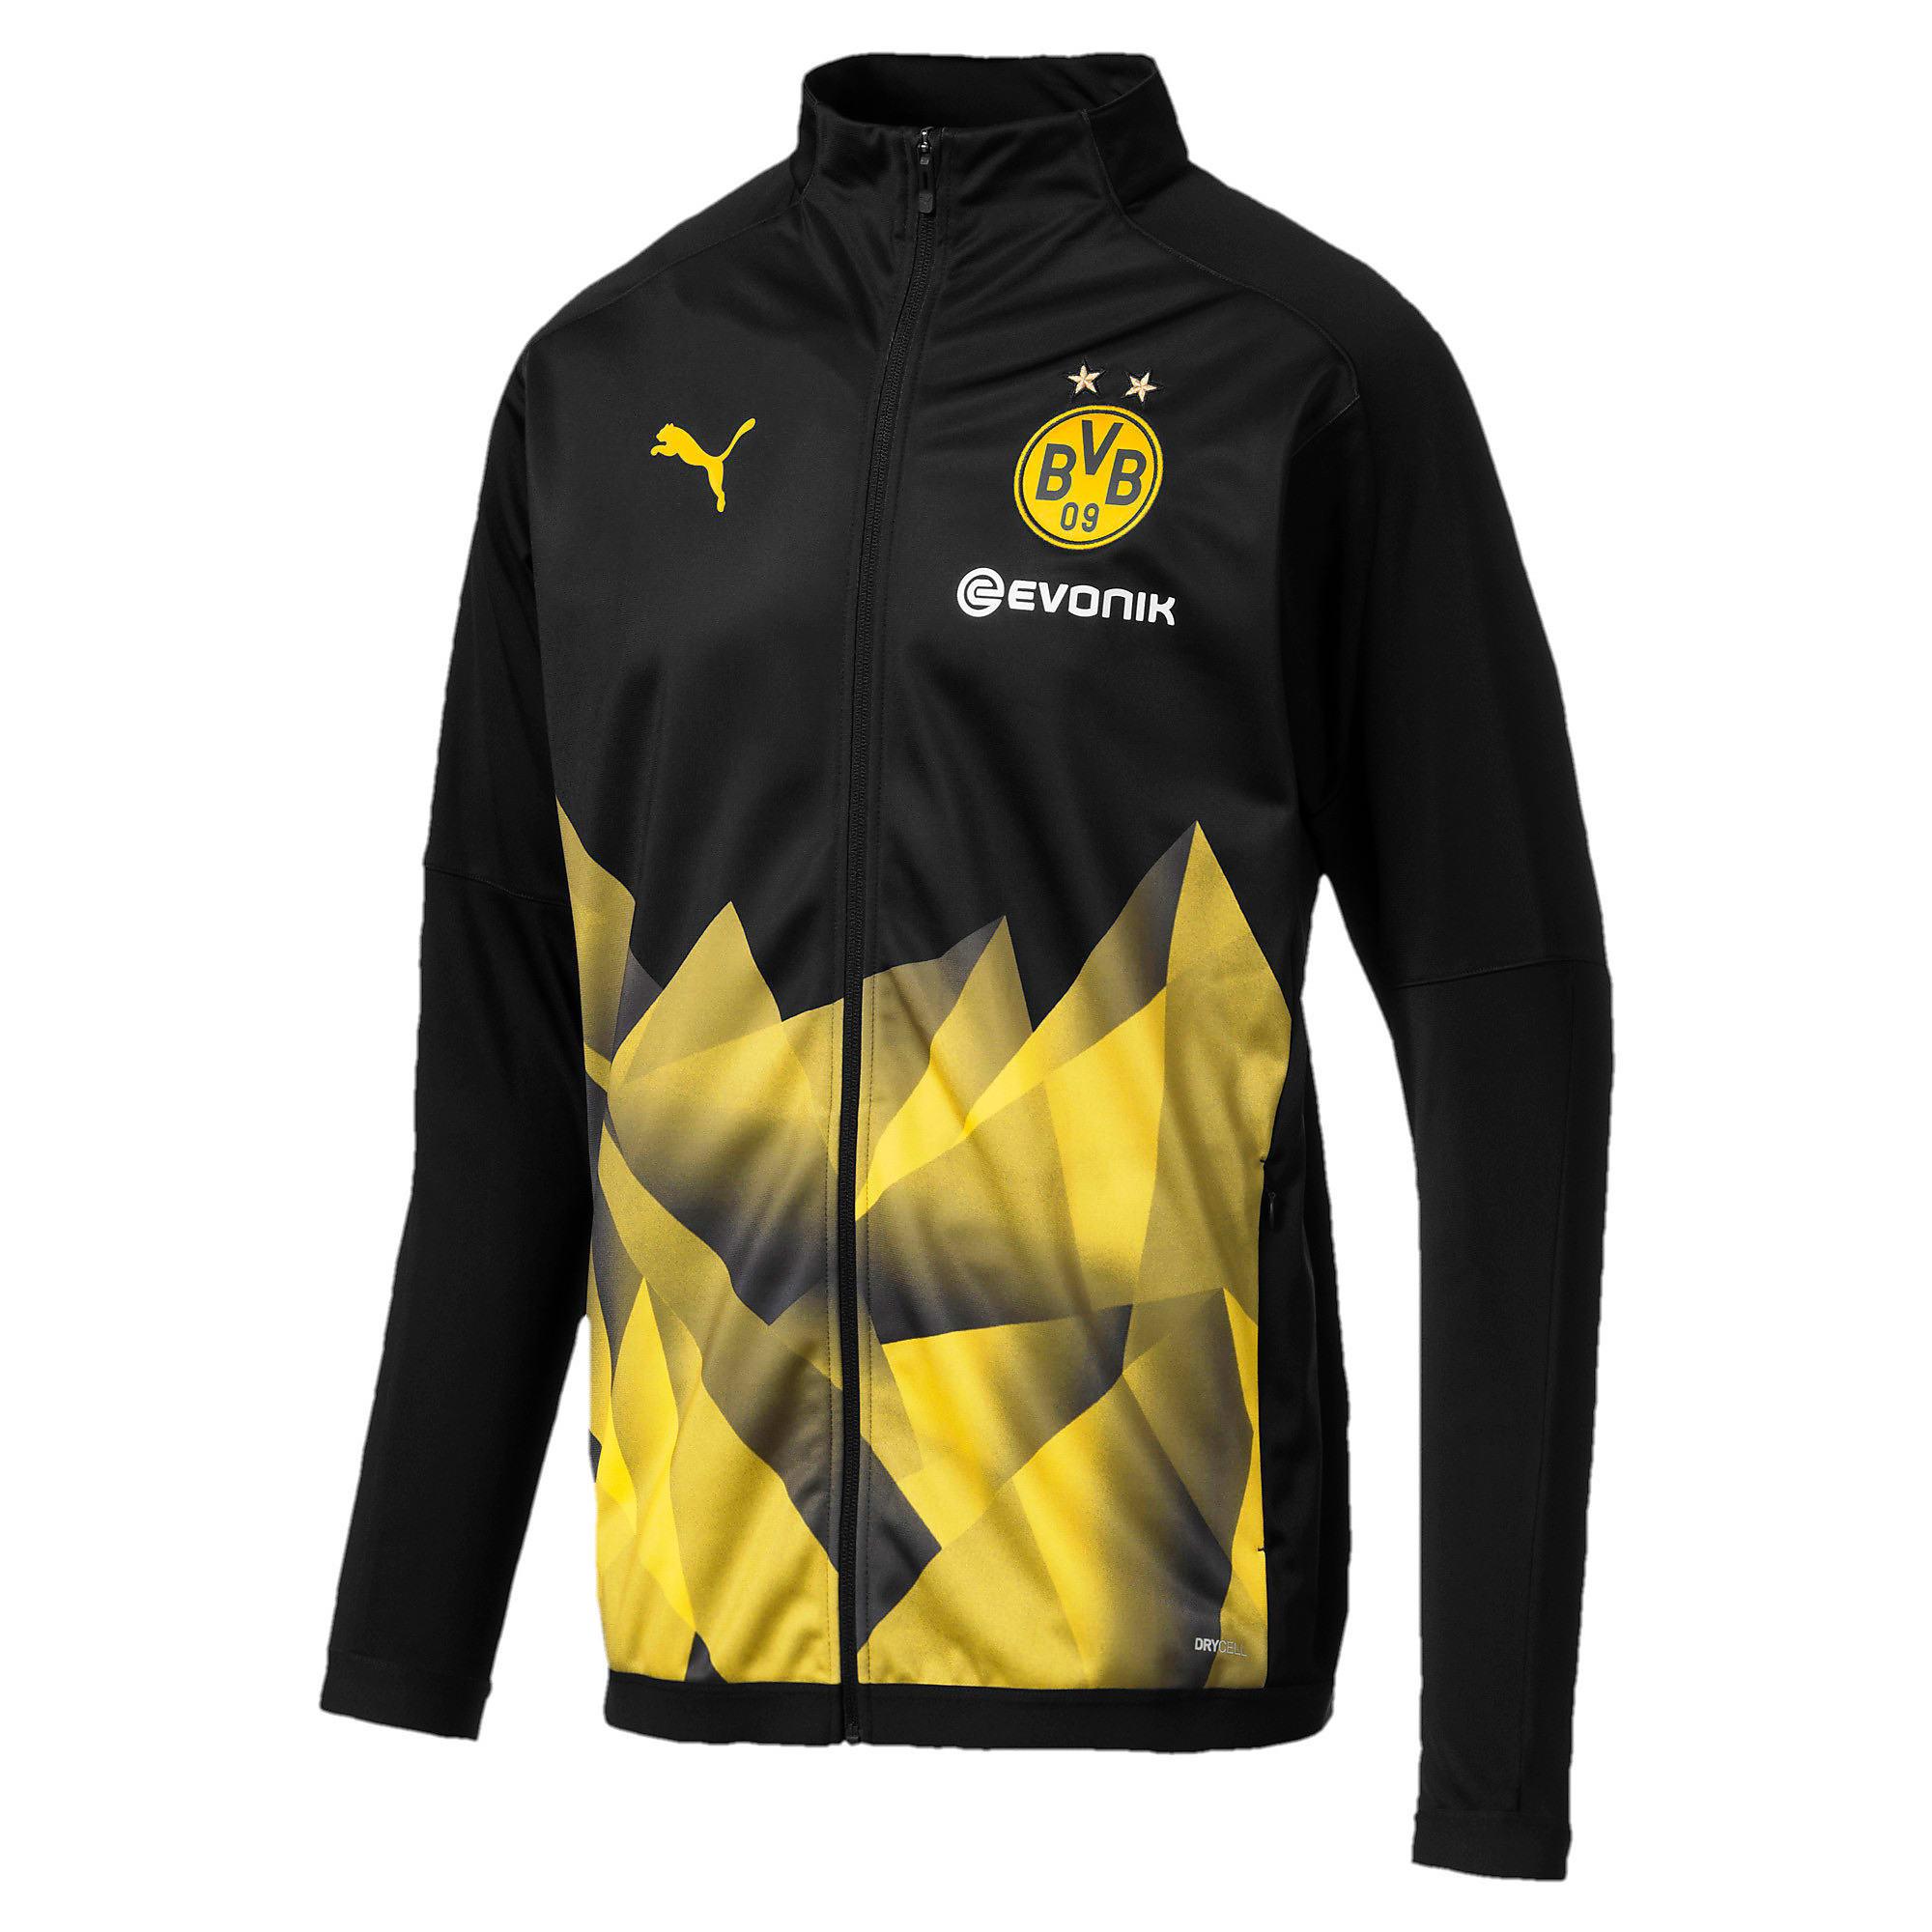 Thumbnail 1 of ドルトムント BVB INT スタジアム ジャケット, Puma Black-Cyber Yellow, medium-JPN